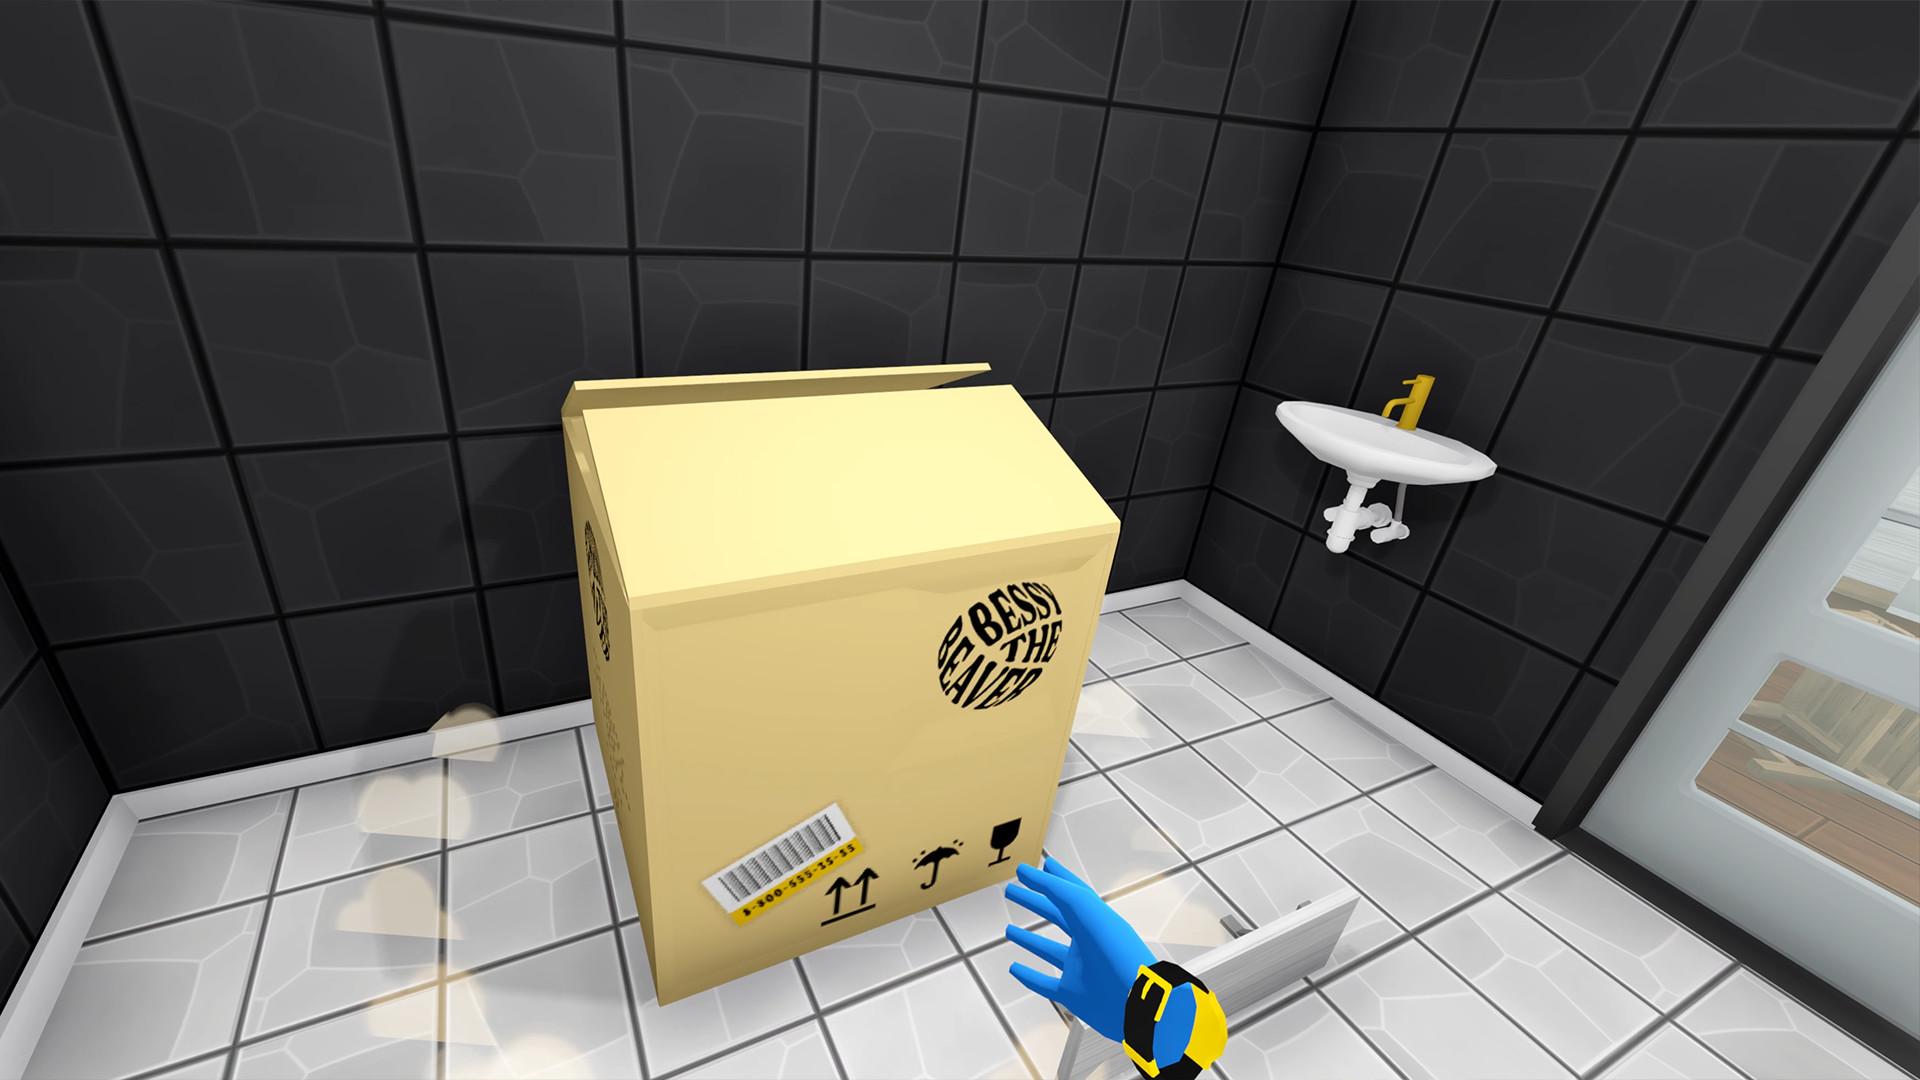 Oculus Quest 游戏《House Flipper VR》房产达人插图(1)